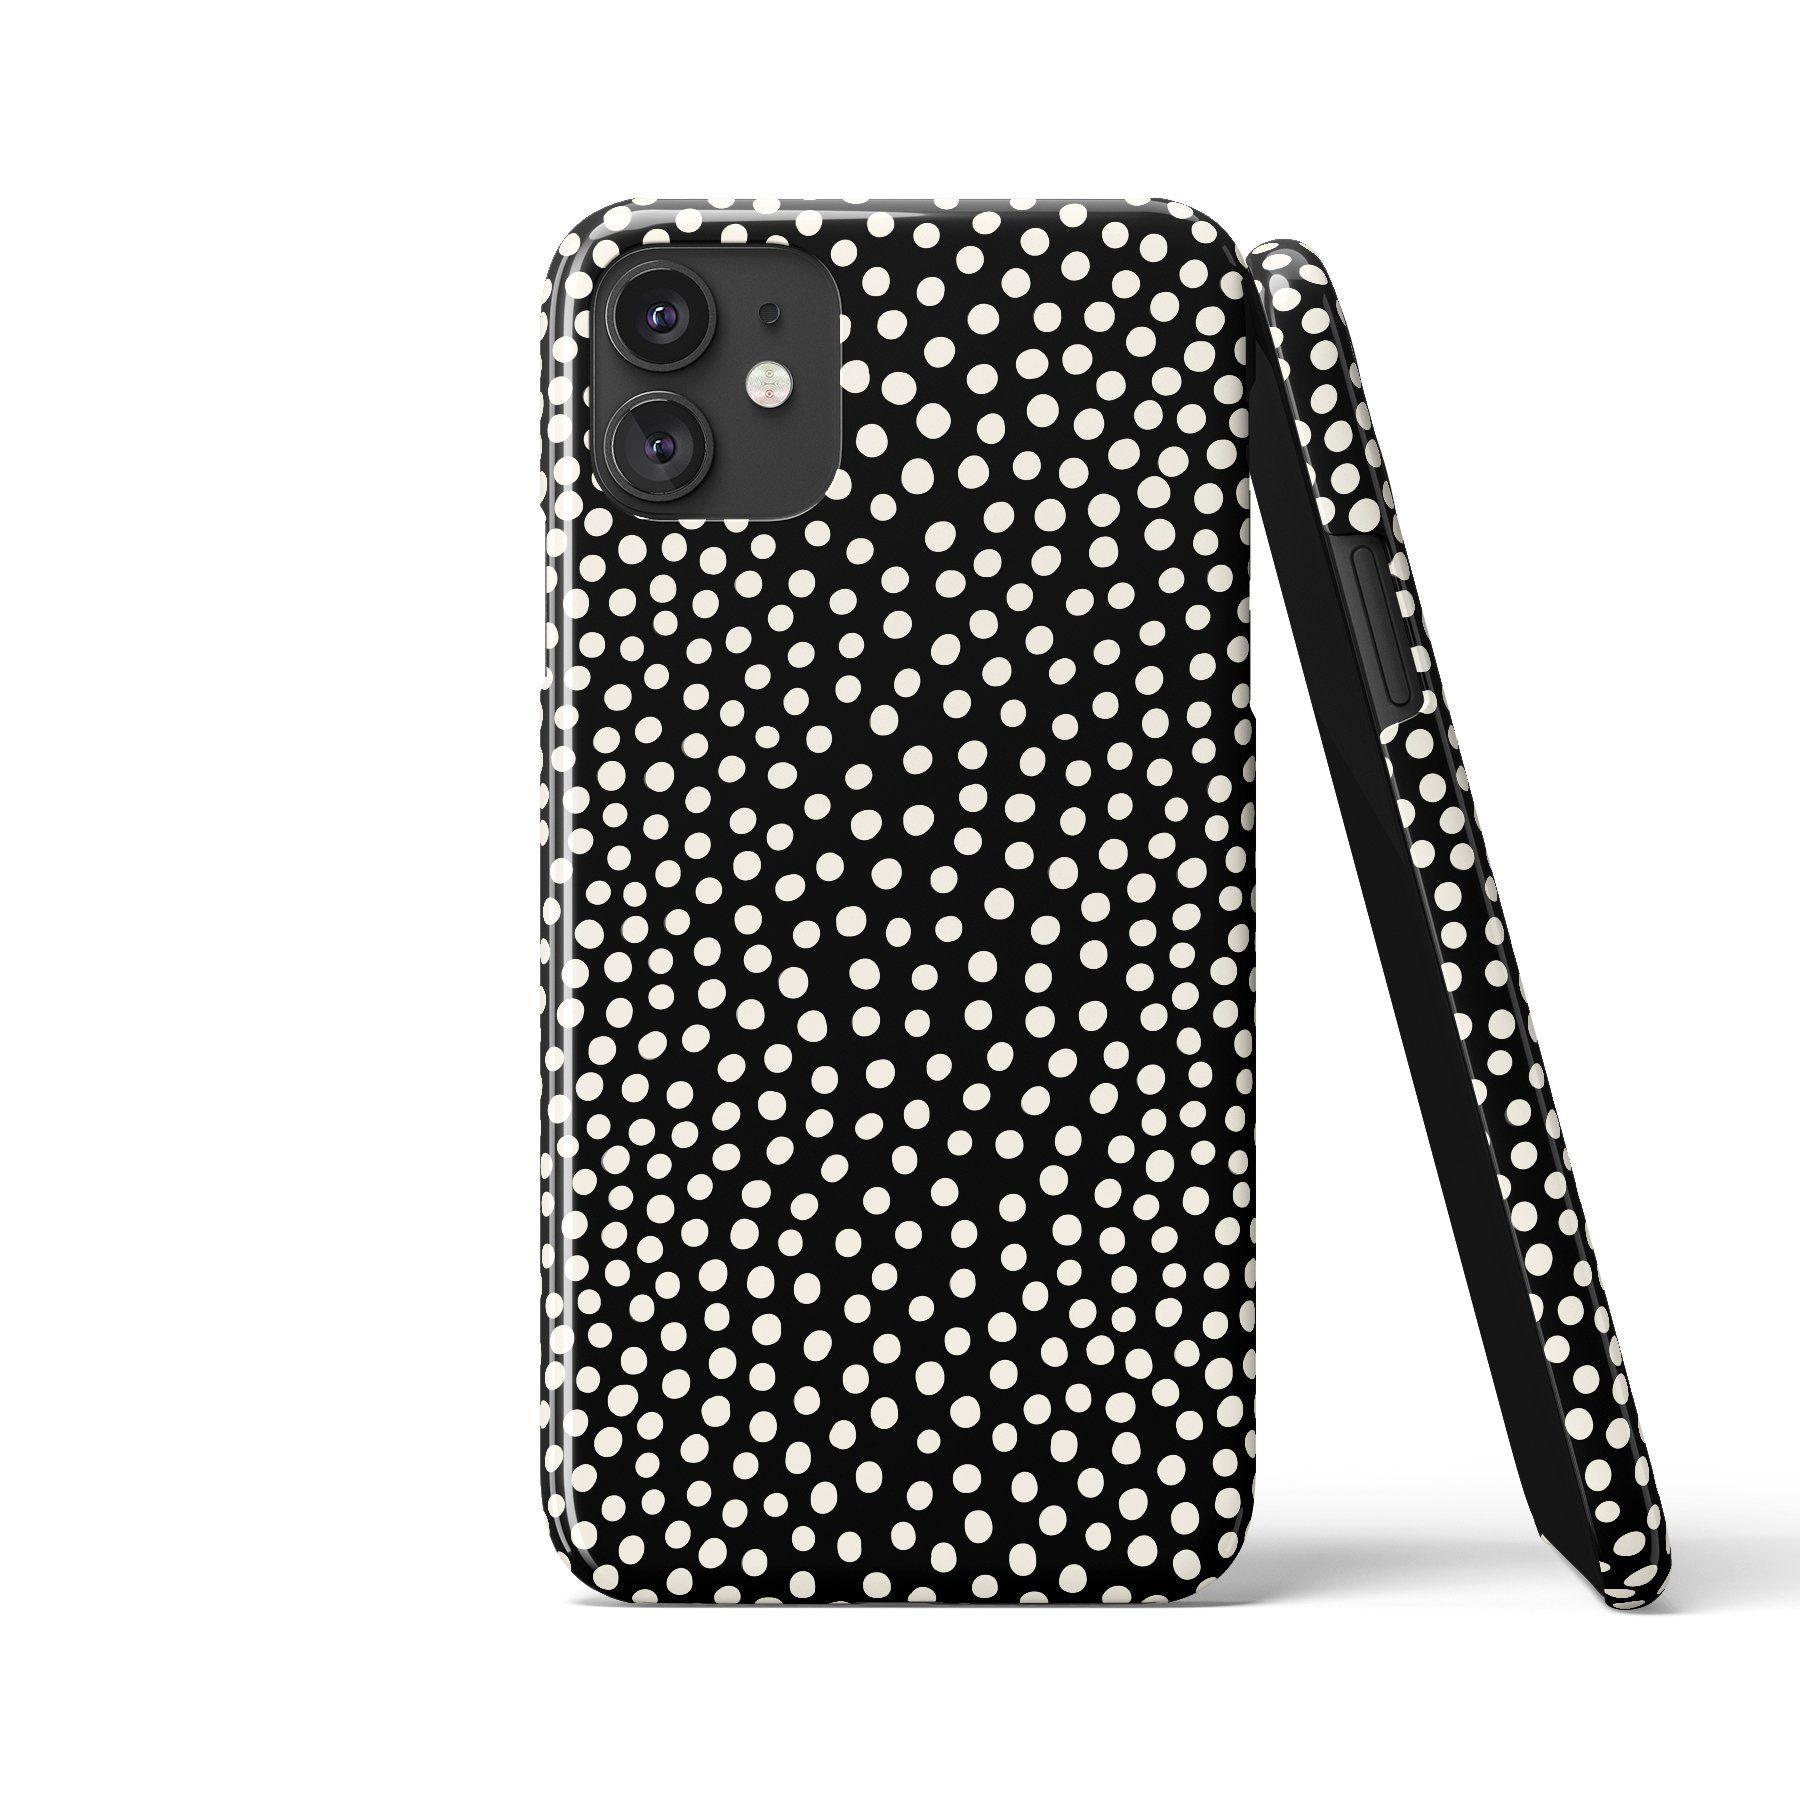 POLKA DOTS Mini Art Black Phone Case - Samsung S20 Ultra / Tough Case - Gloss